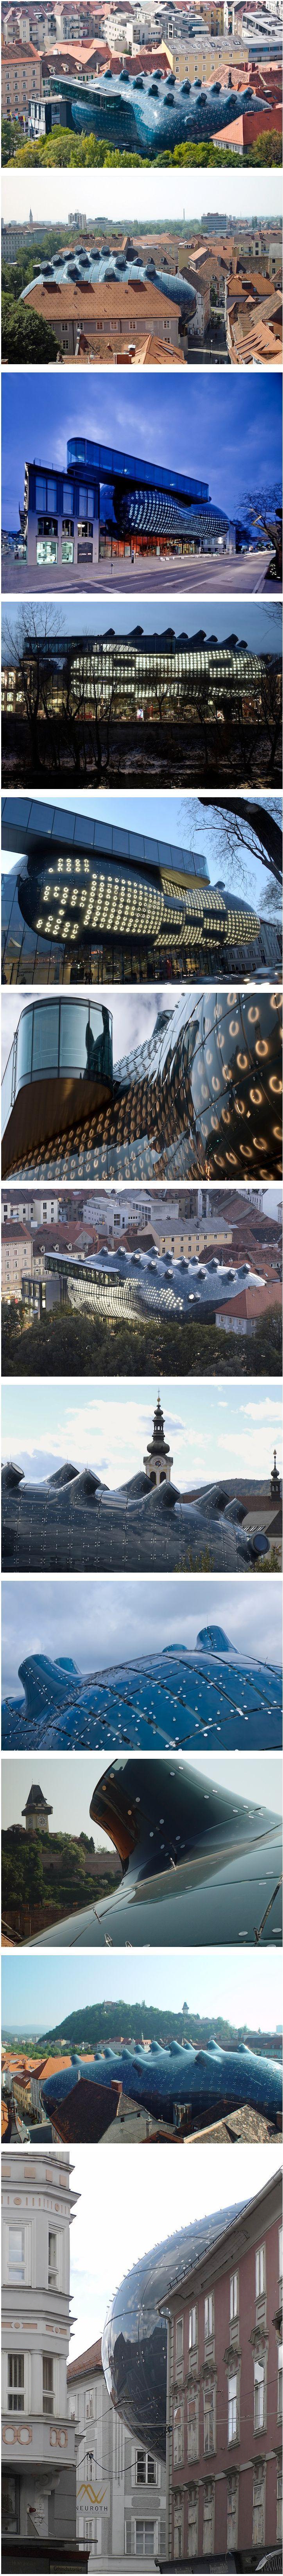 Kunsthaus – Graz